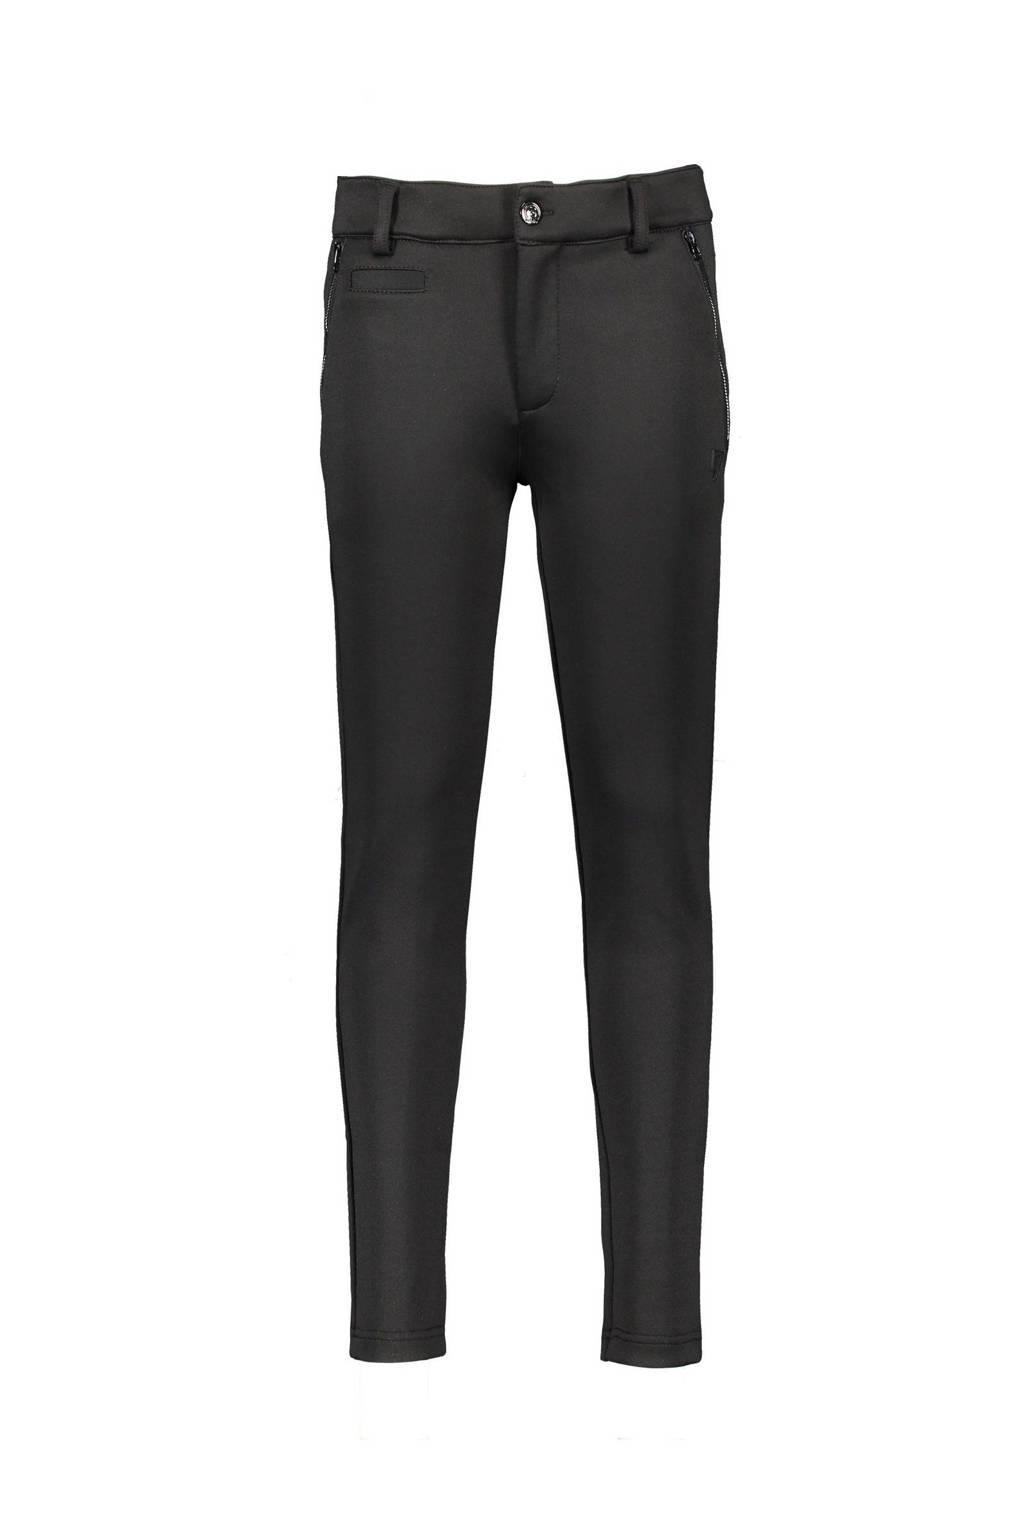 Bellaire slim fit broek s-chino zwart, Zwart